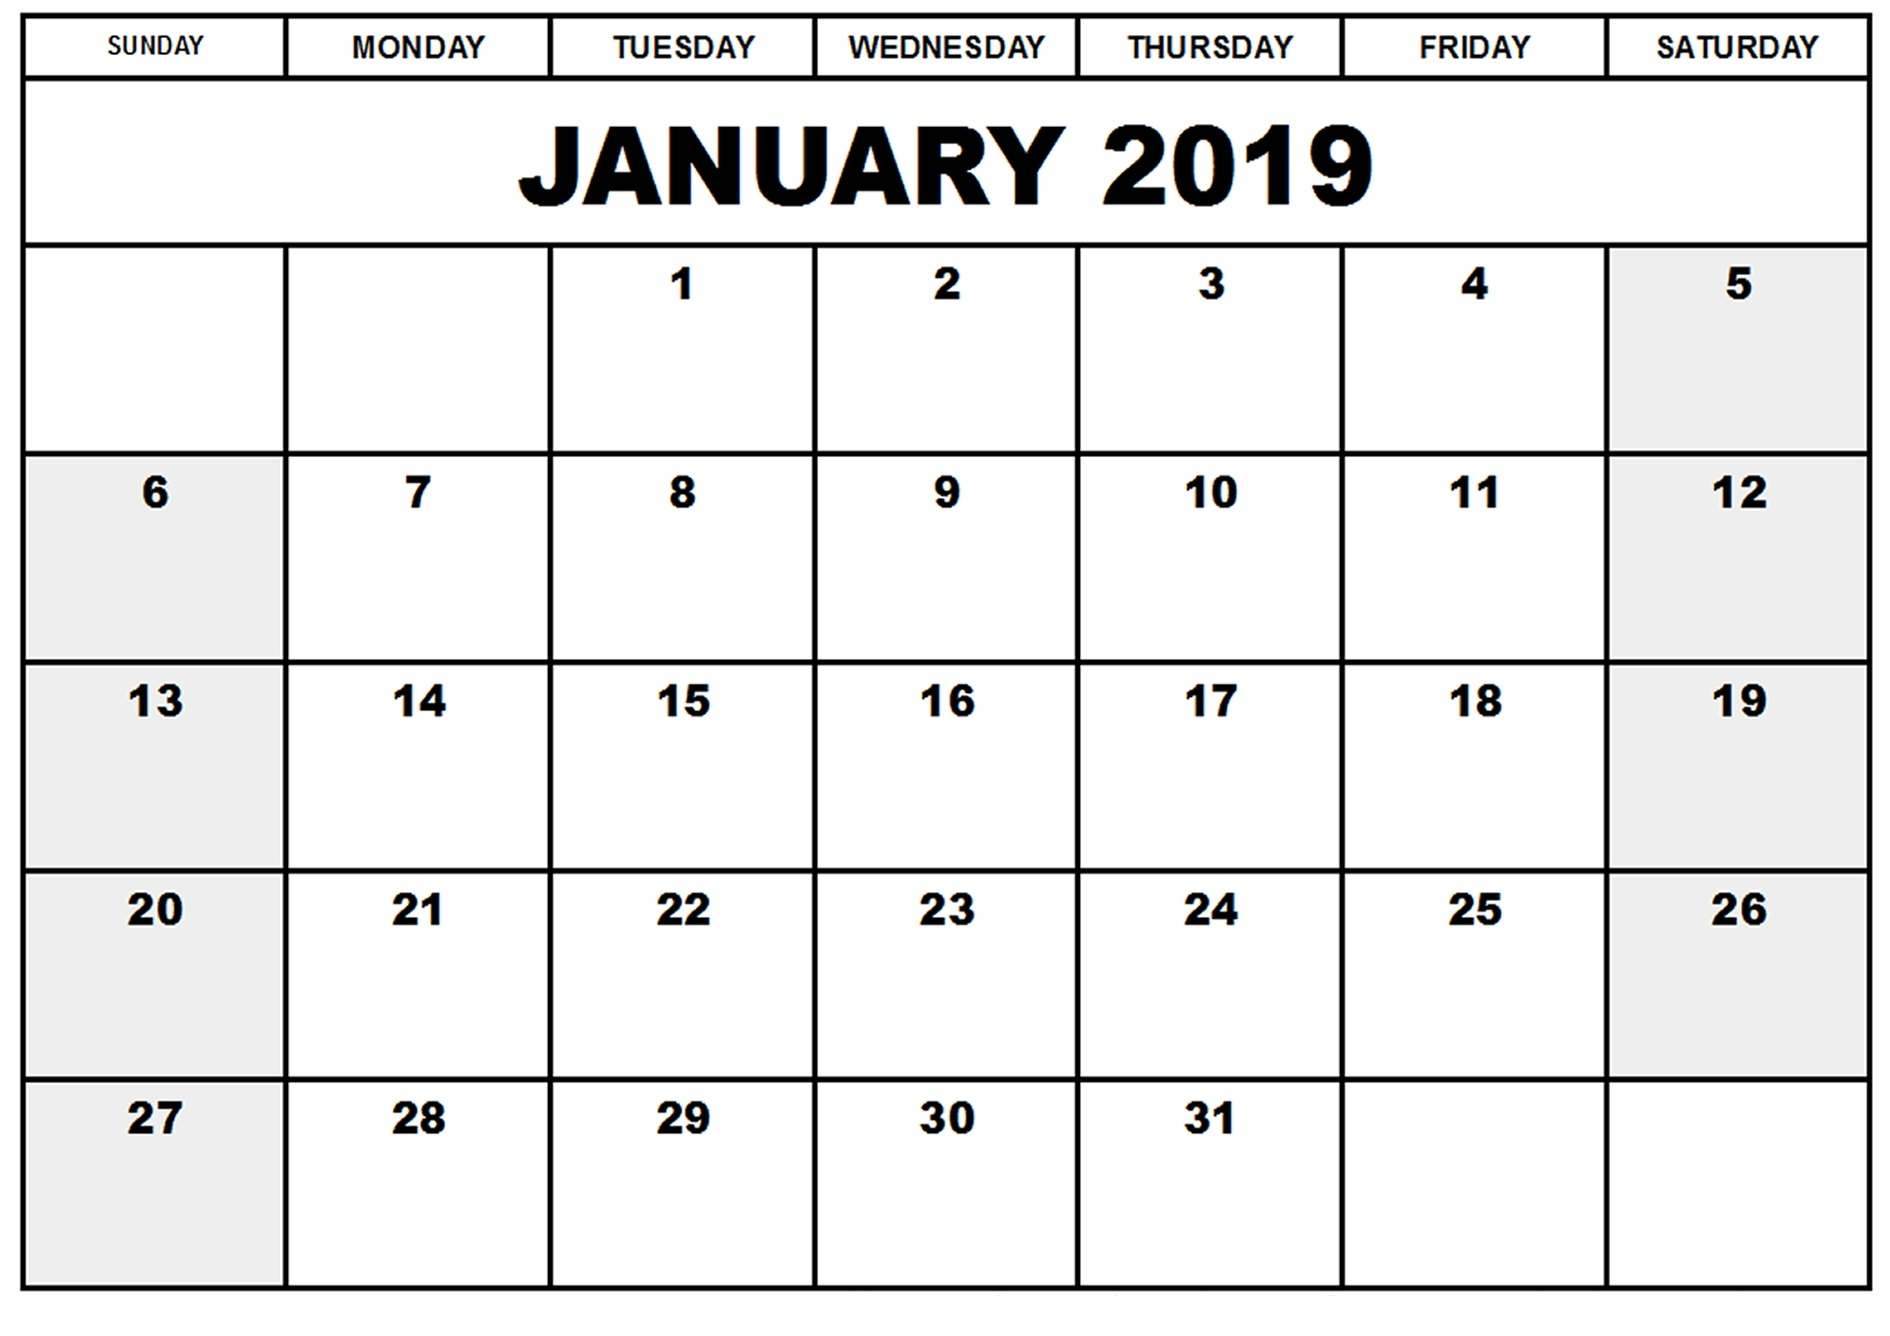 Calendar January 2019 Word - Free Printable Calendar Templates Blank